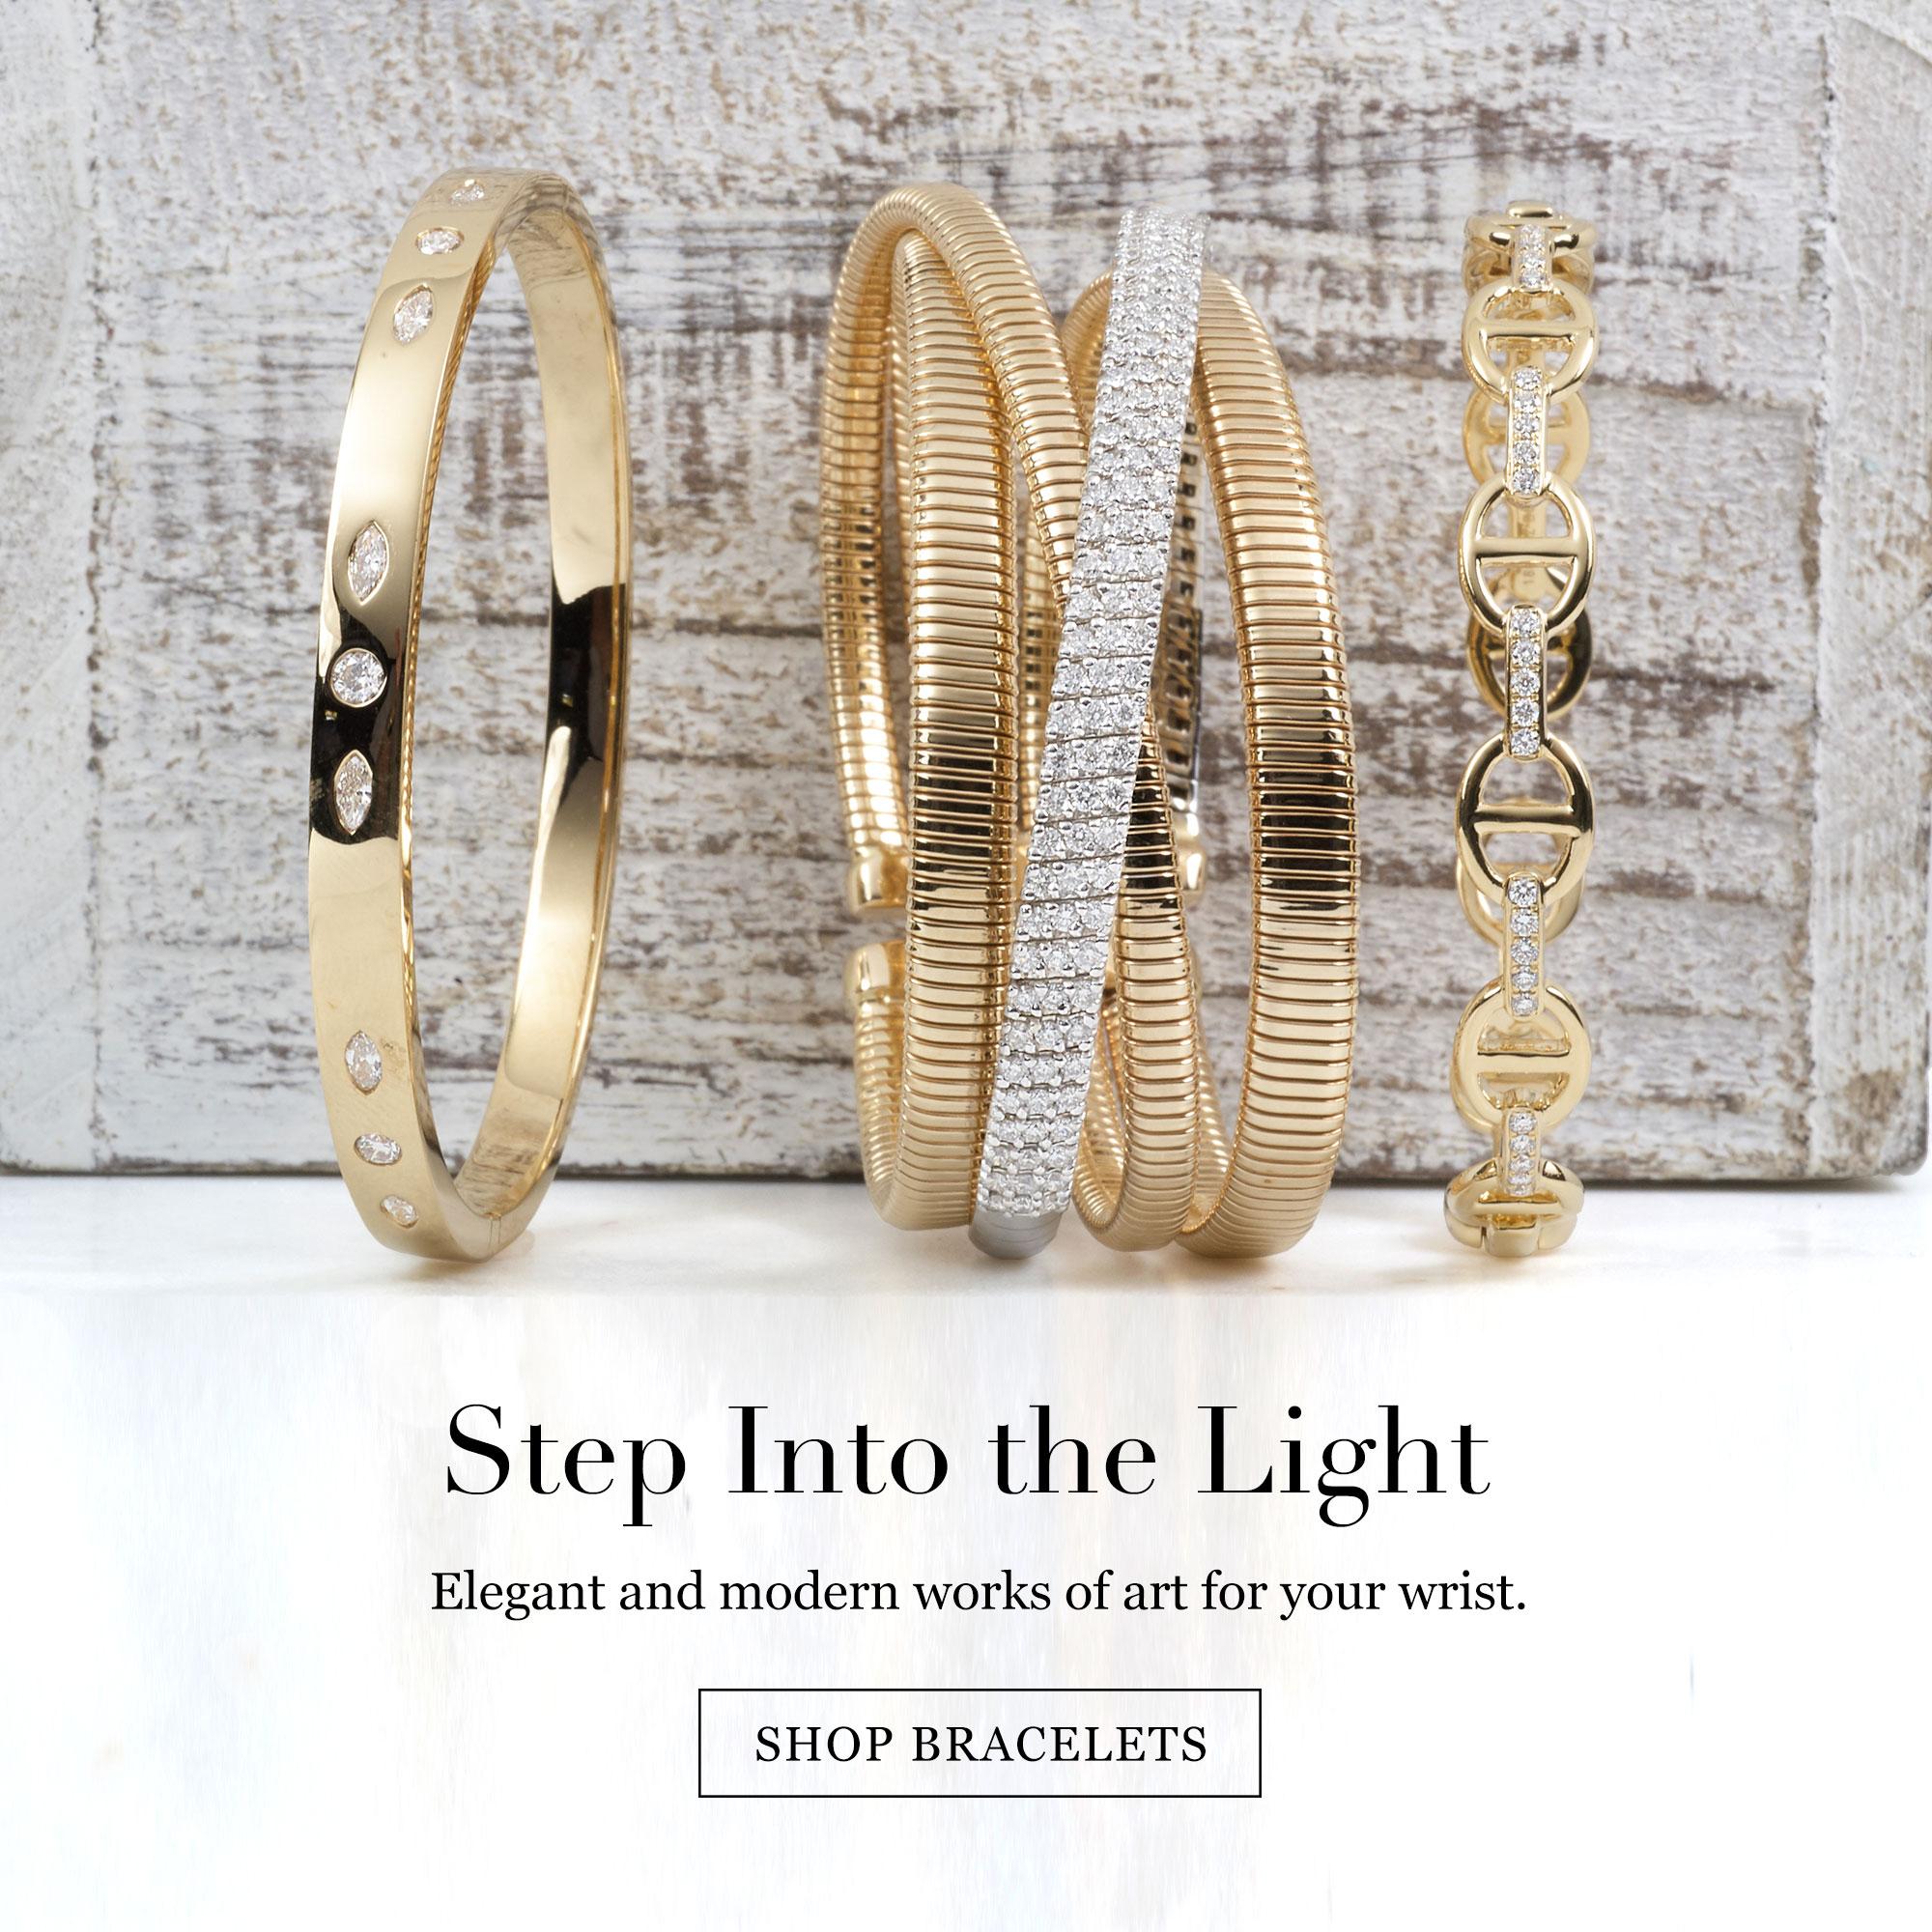 Bracelets-Feb18-web.jpg